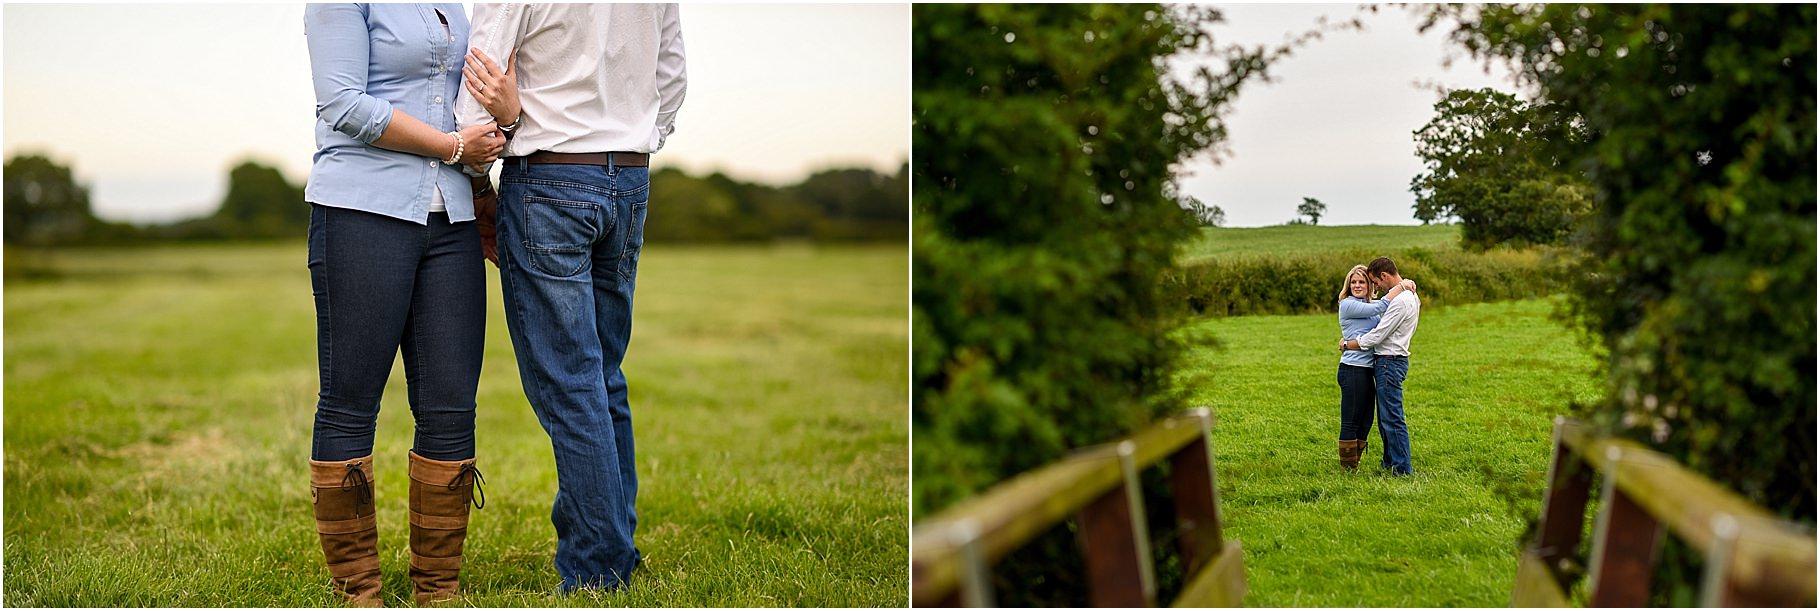 lancashire-pre-wedding-14.jpg